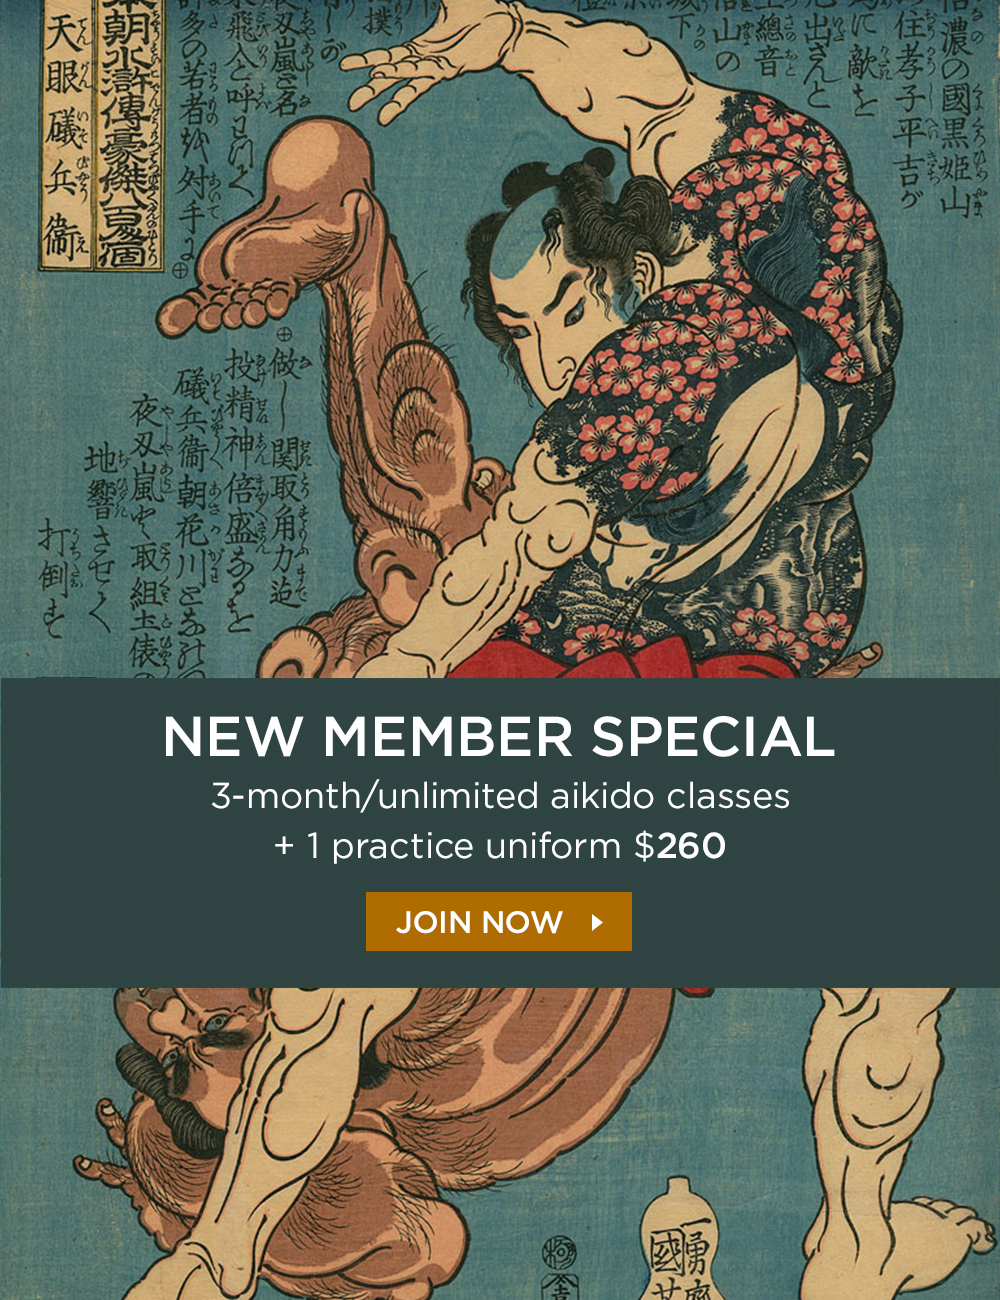 New-Member-Special-Get-Started.jpg